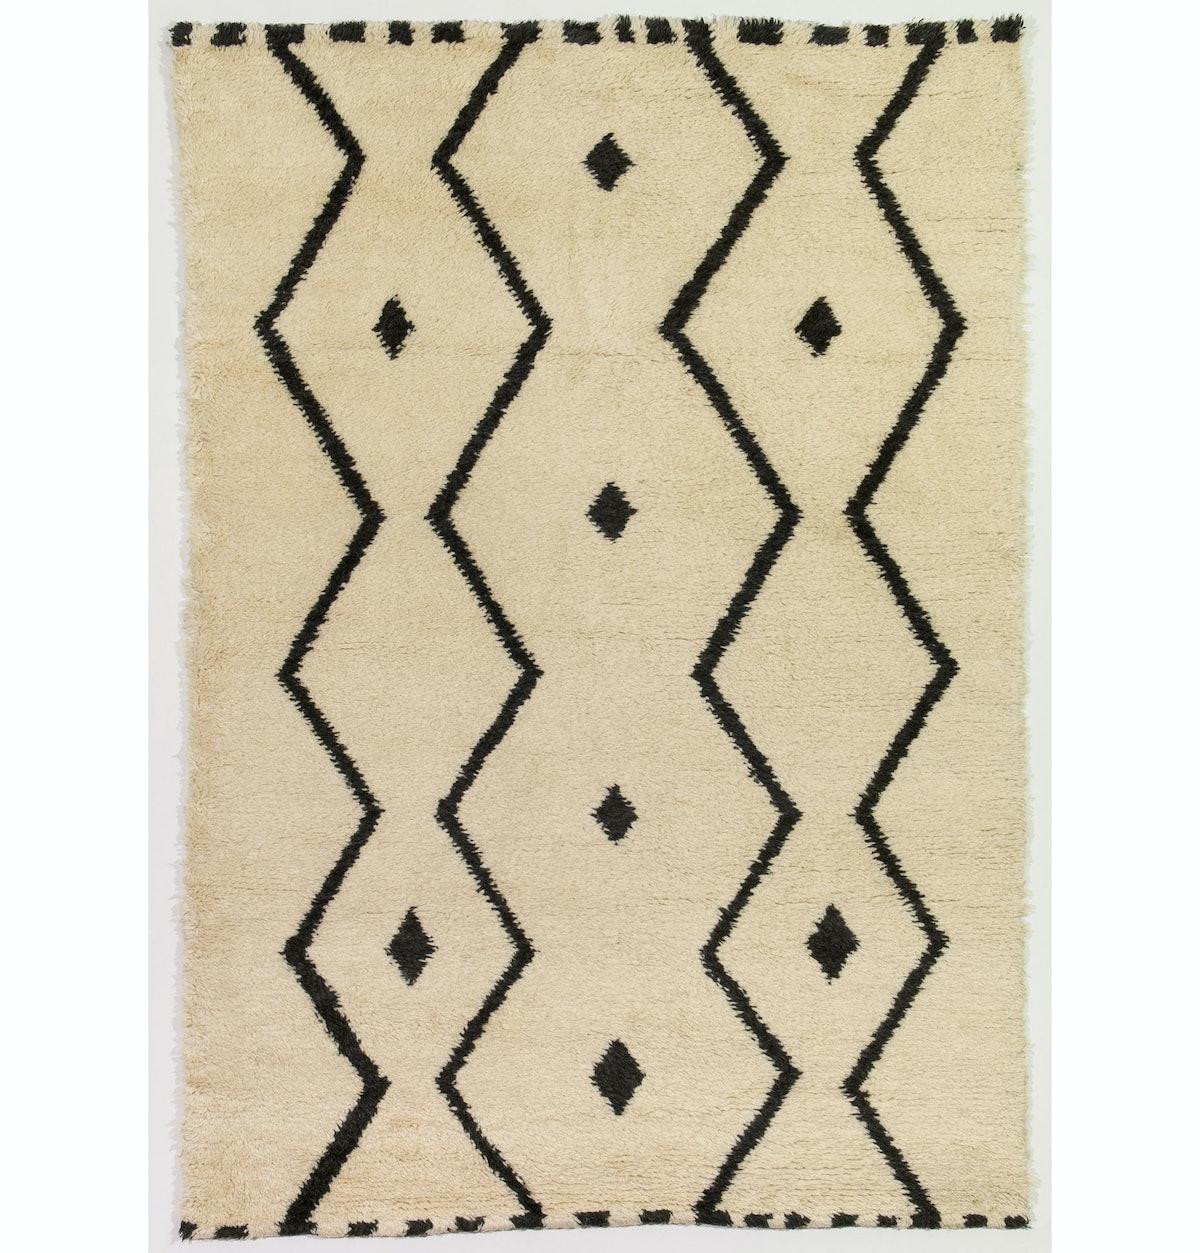 Project Mala Carpet